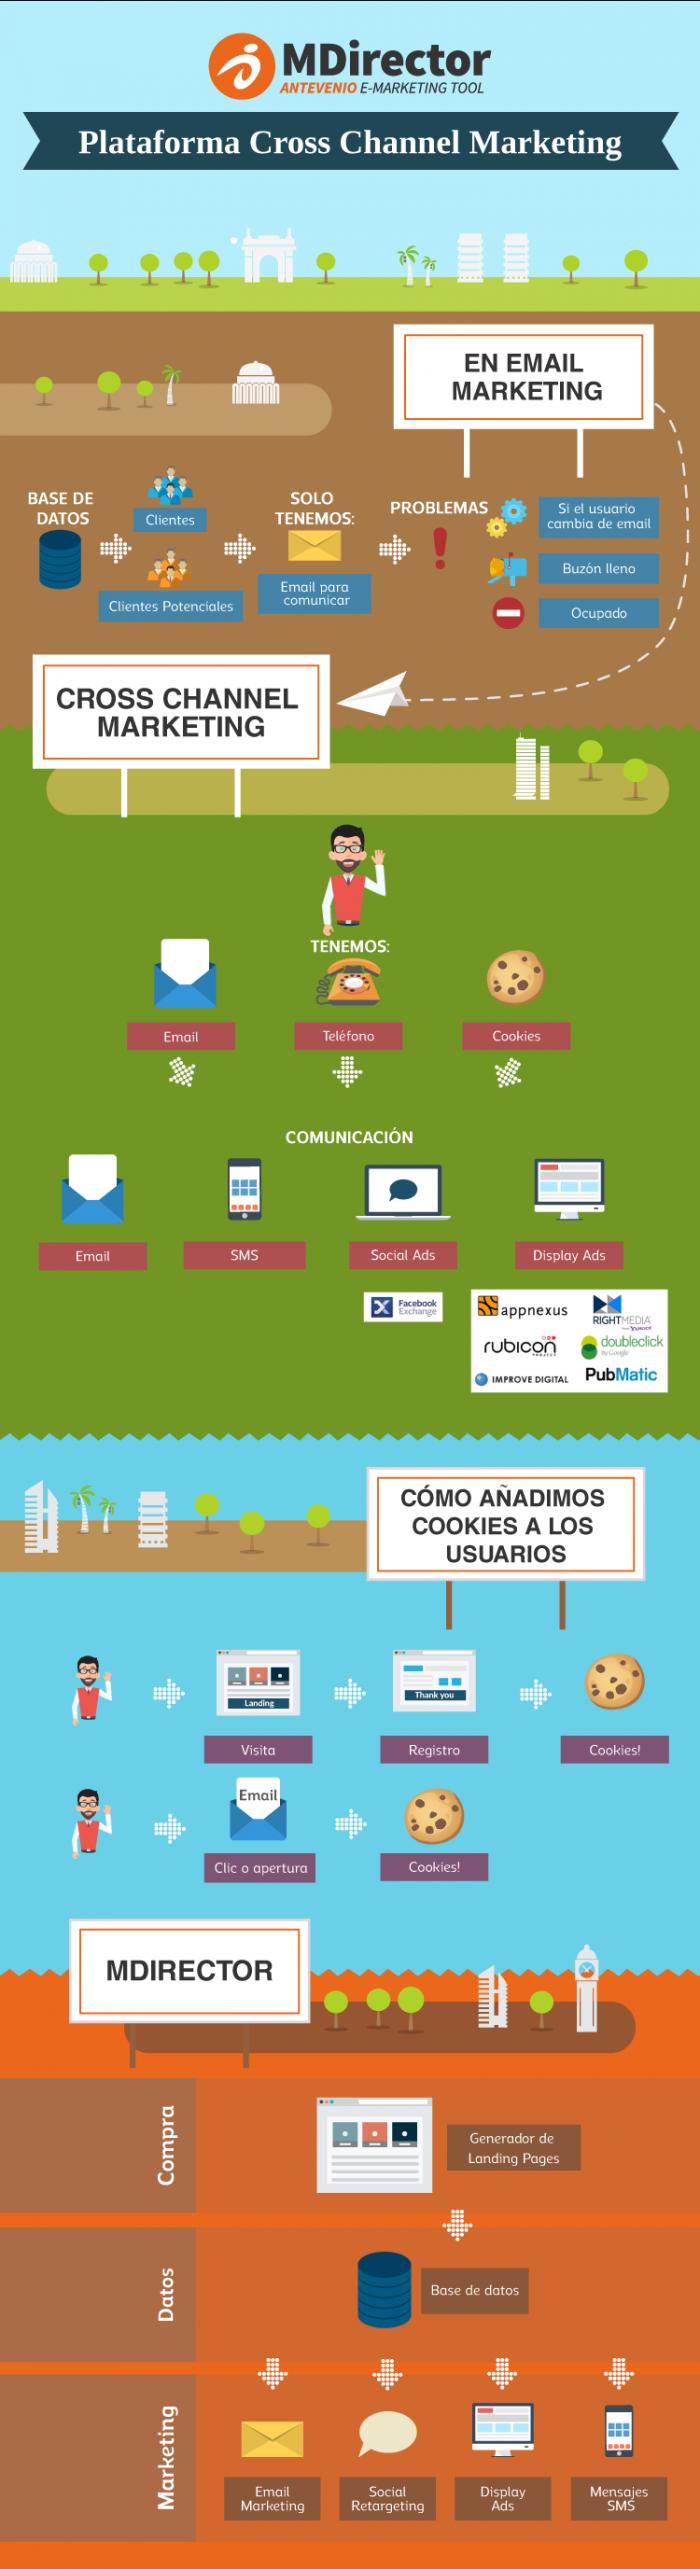 MDirector-Cross-Channel-Marketing-Tool-ES